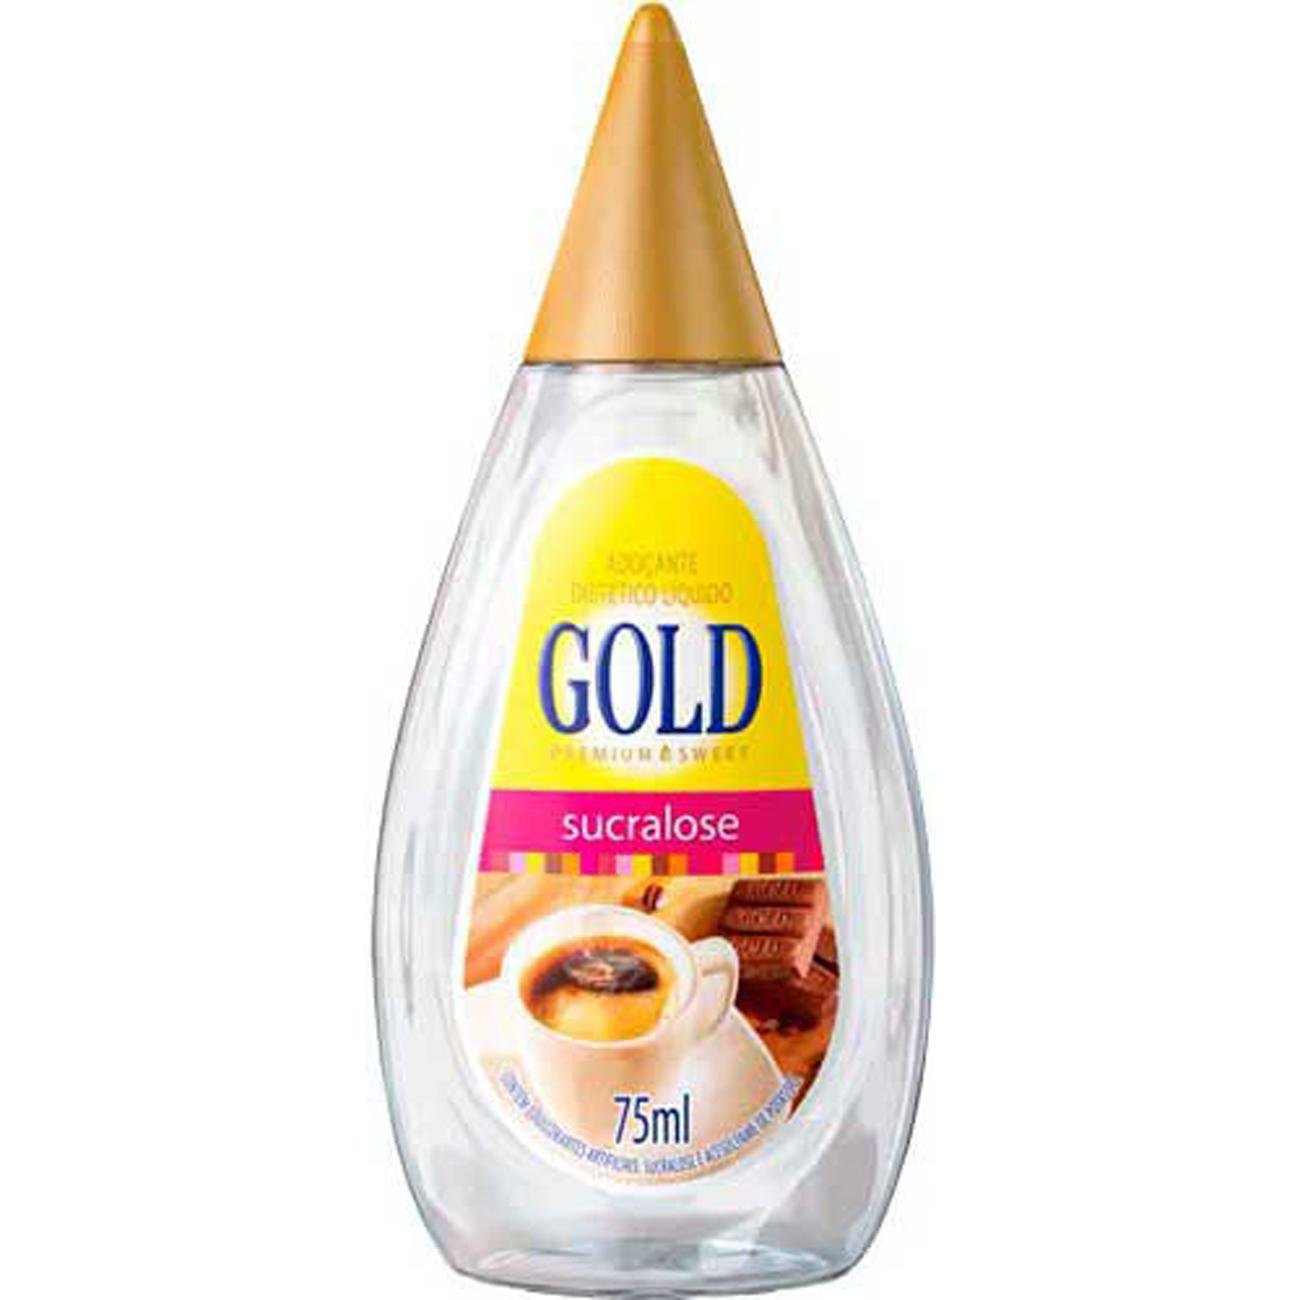 Adocante Gold Sucralose 75Ml